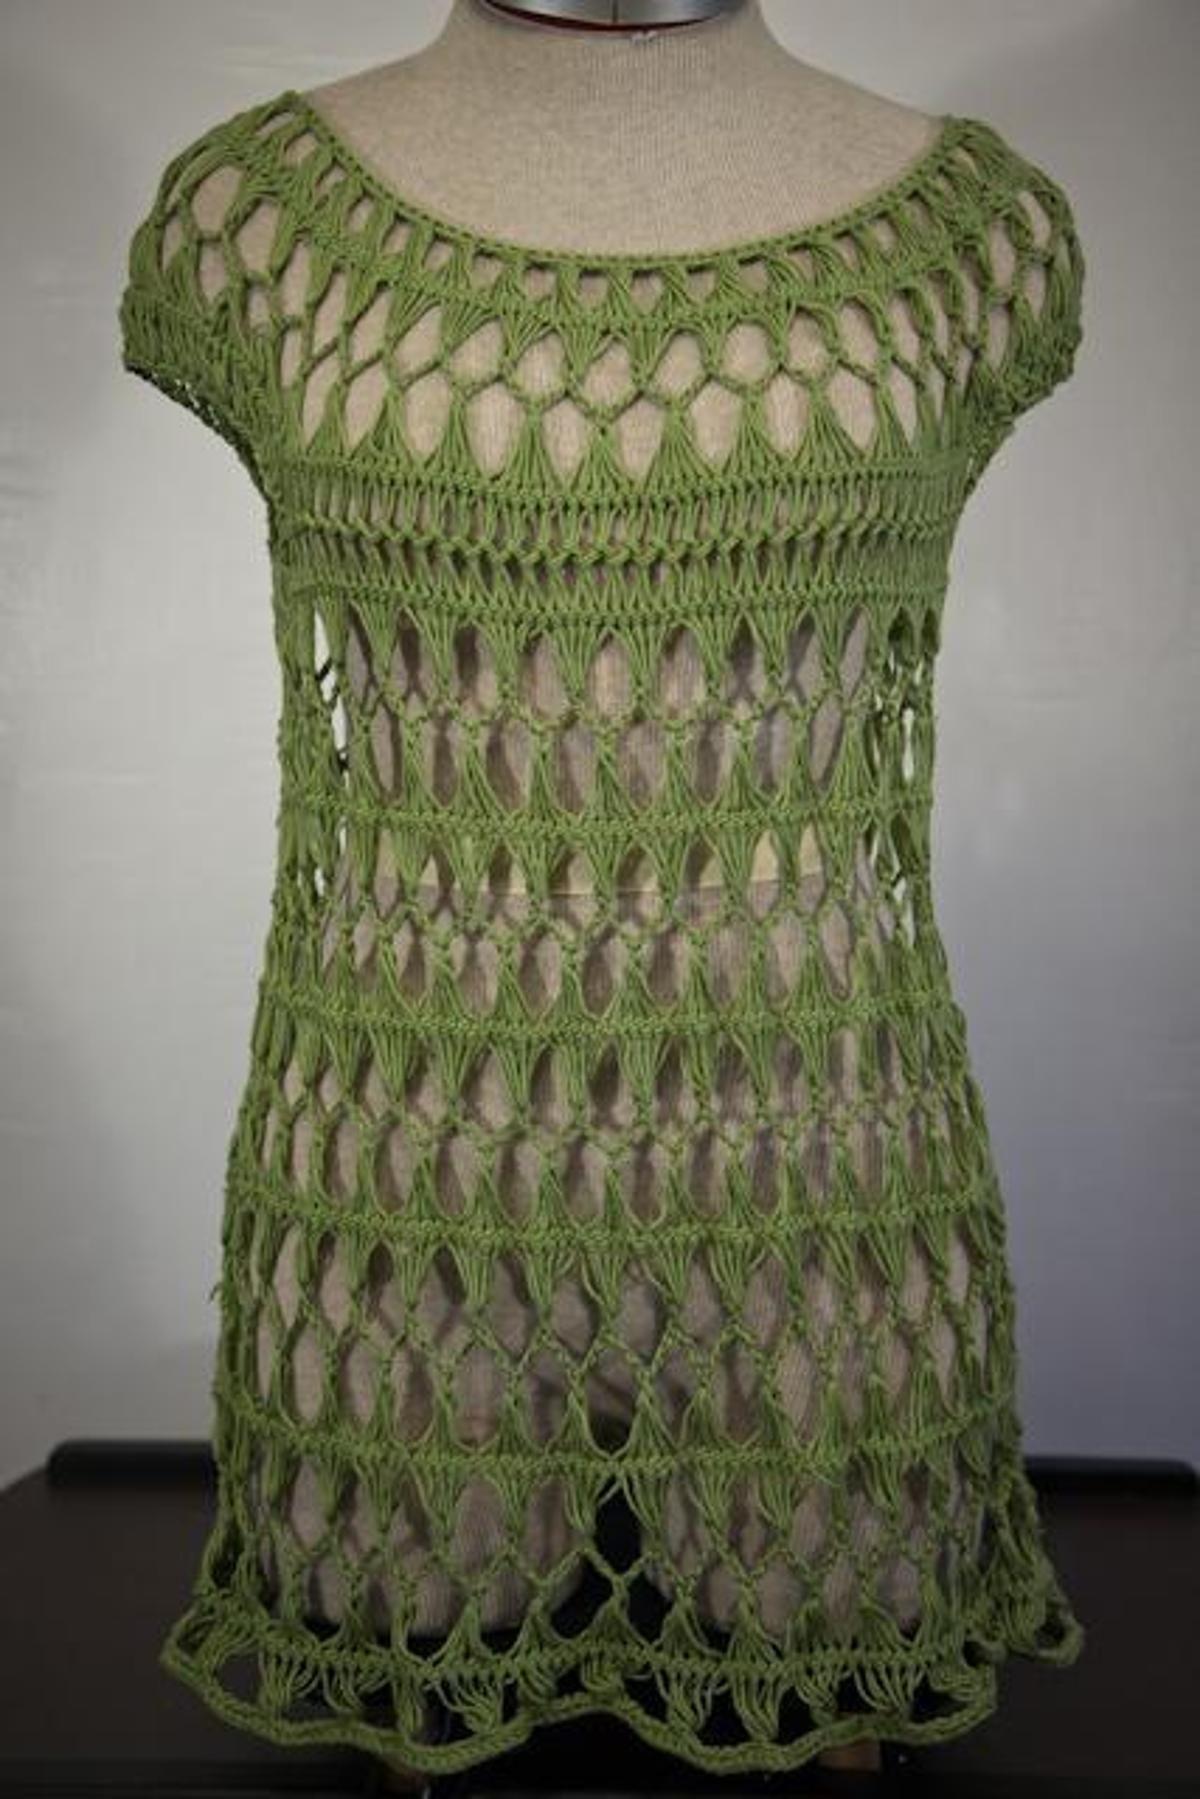 Sage tunic sage tunics and crocheting patterns patterns crochet pattern bankloansurffo Image collections